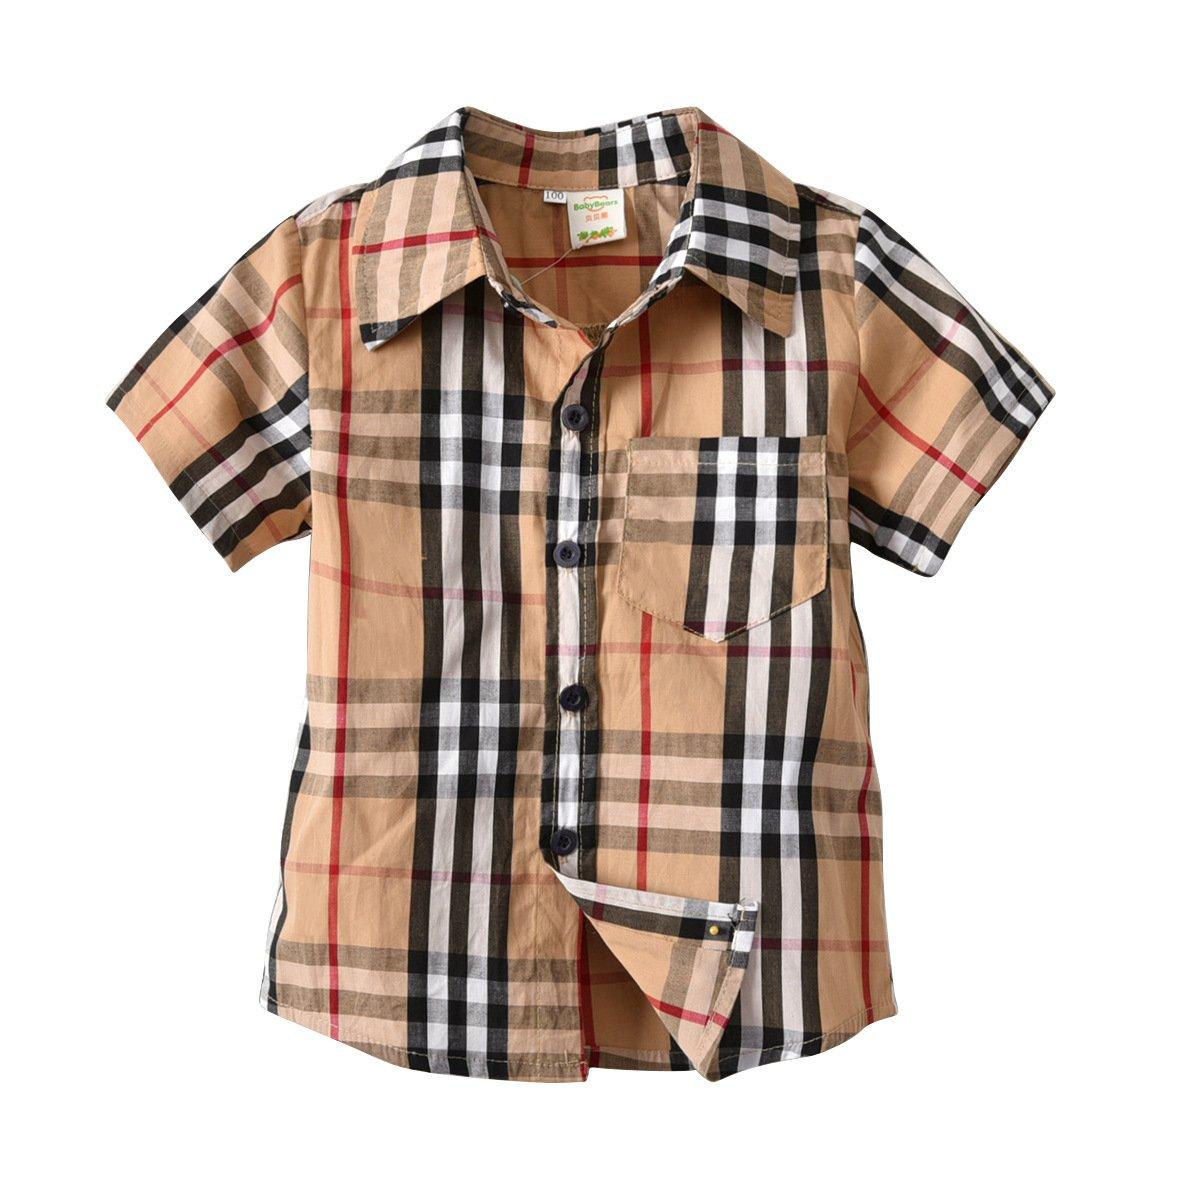 Baby Boys Little Boy Kids 2 Pieces Clothing Set Jean Short Pants Outfits